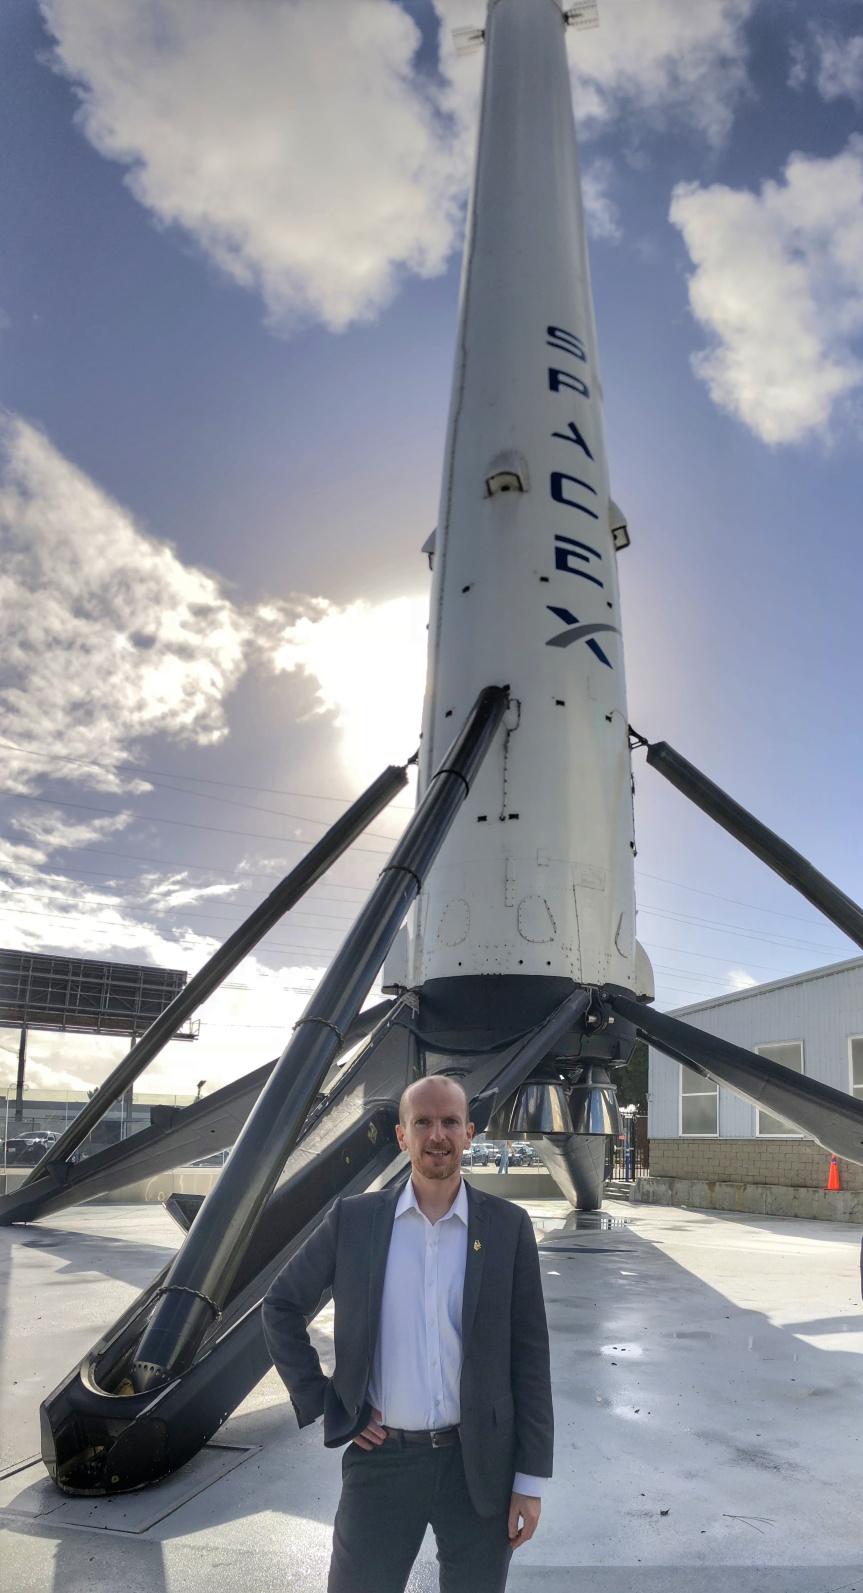 Myriota launches on Spaceflight's SmallSat Express mission to help battle Australia'sdrought